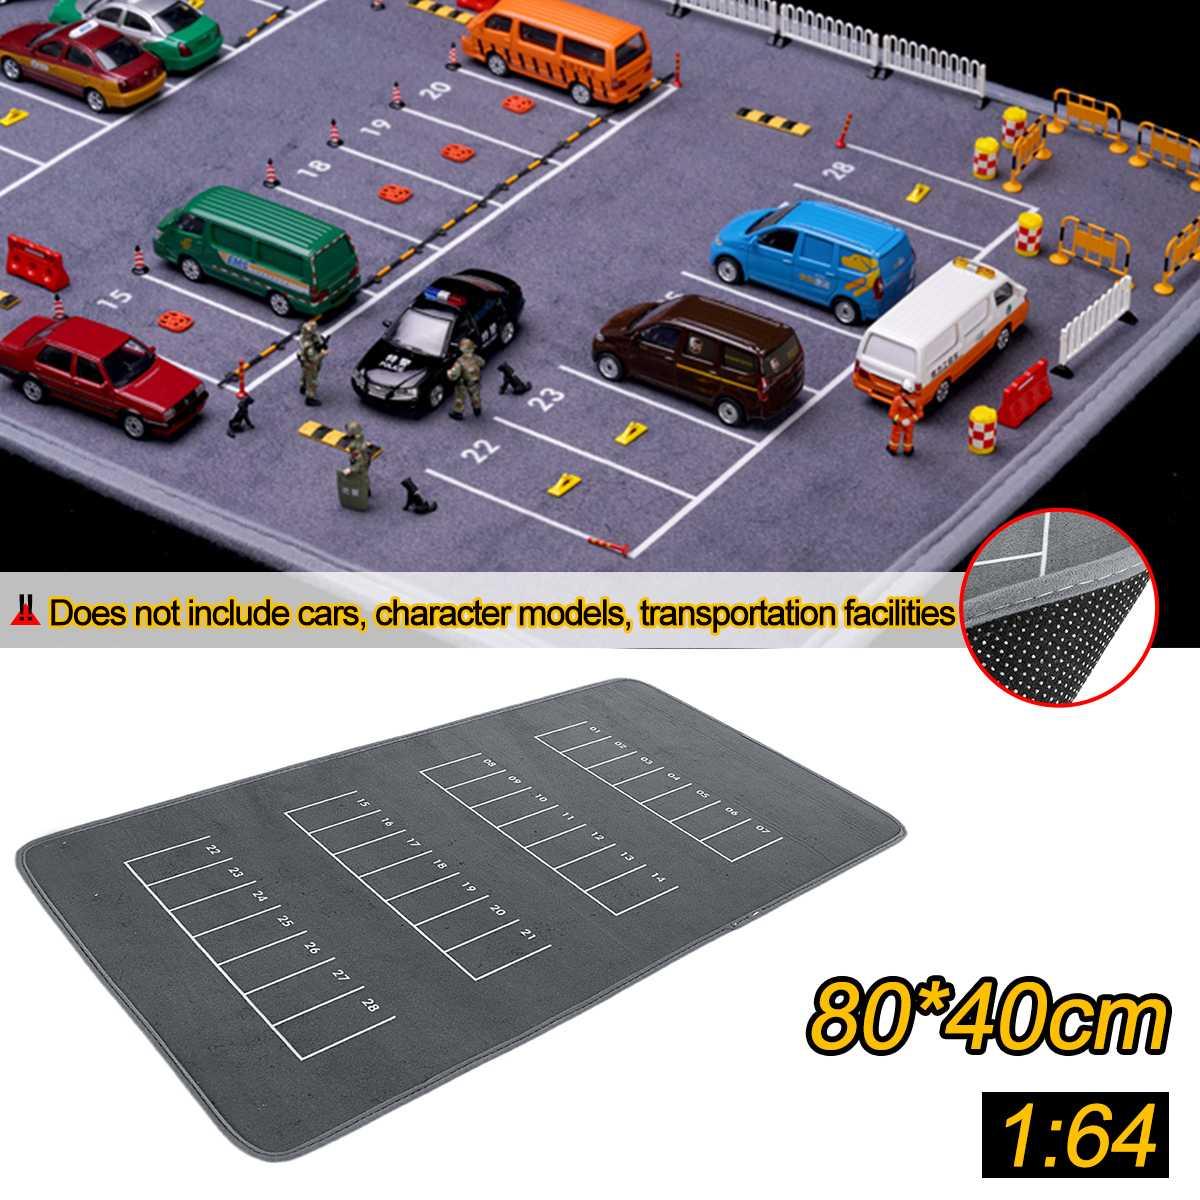 80x40cm 1/64 Anti-slip Rubbe Parking Pad Car Model Scene Road Game Pad For Desktop PC Laptop Computer Model Car